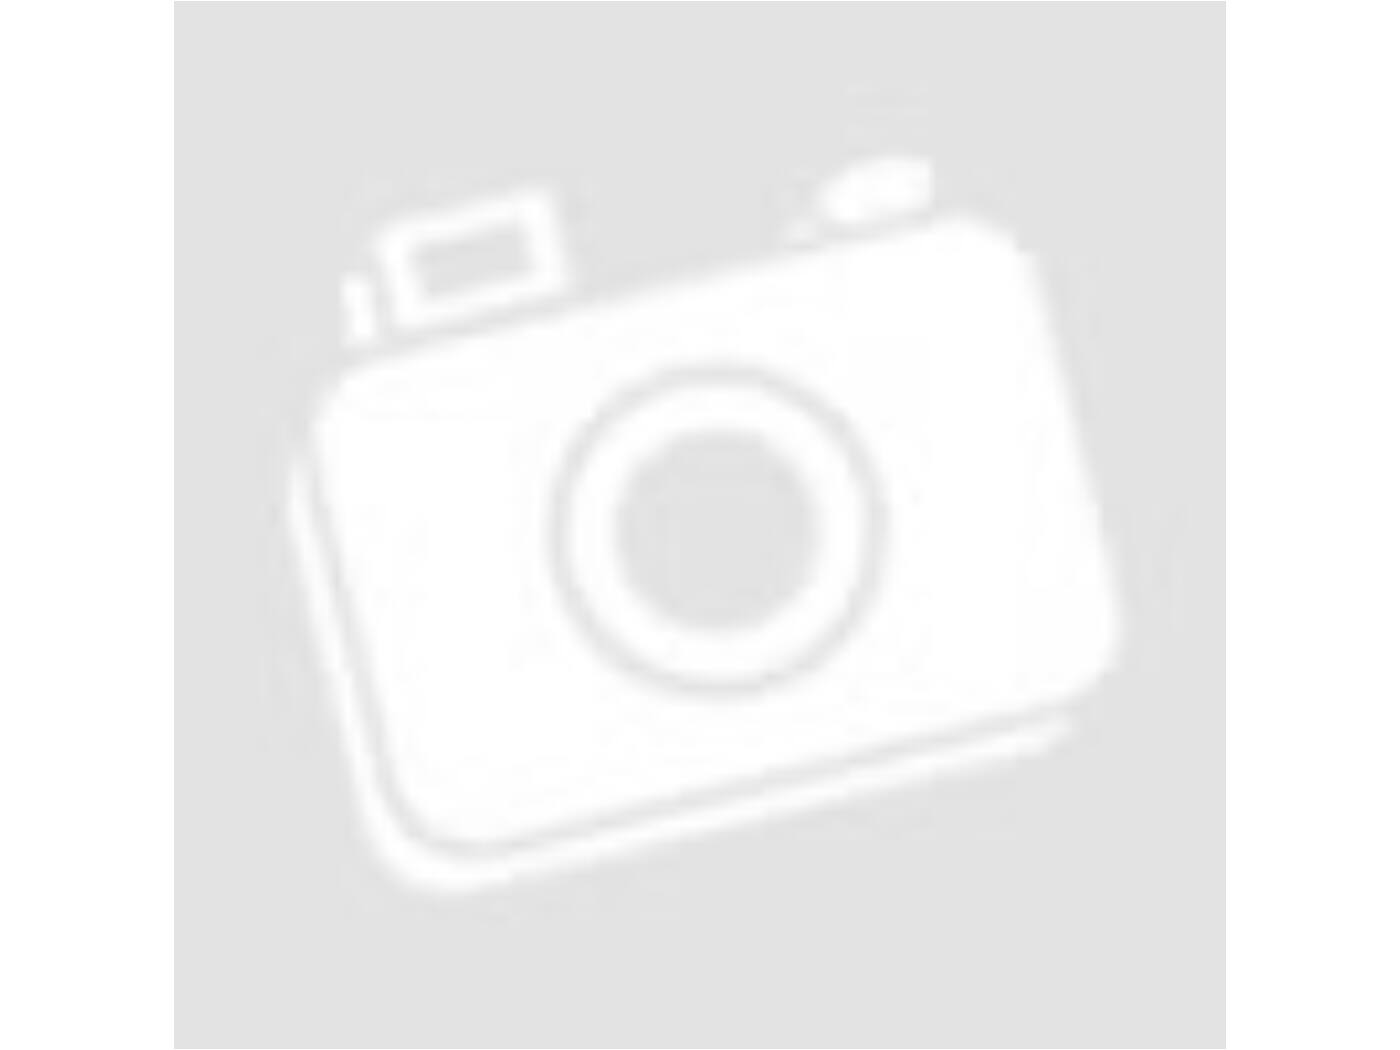 Sinteros laminált parketta, 13 mm, matt